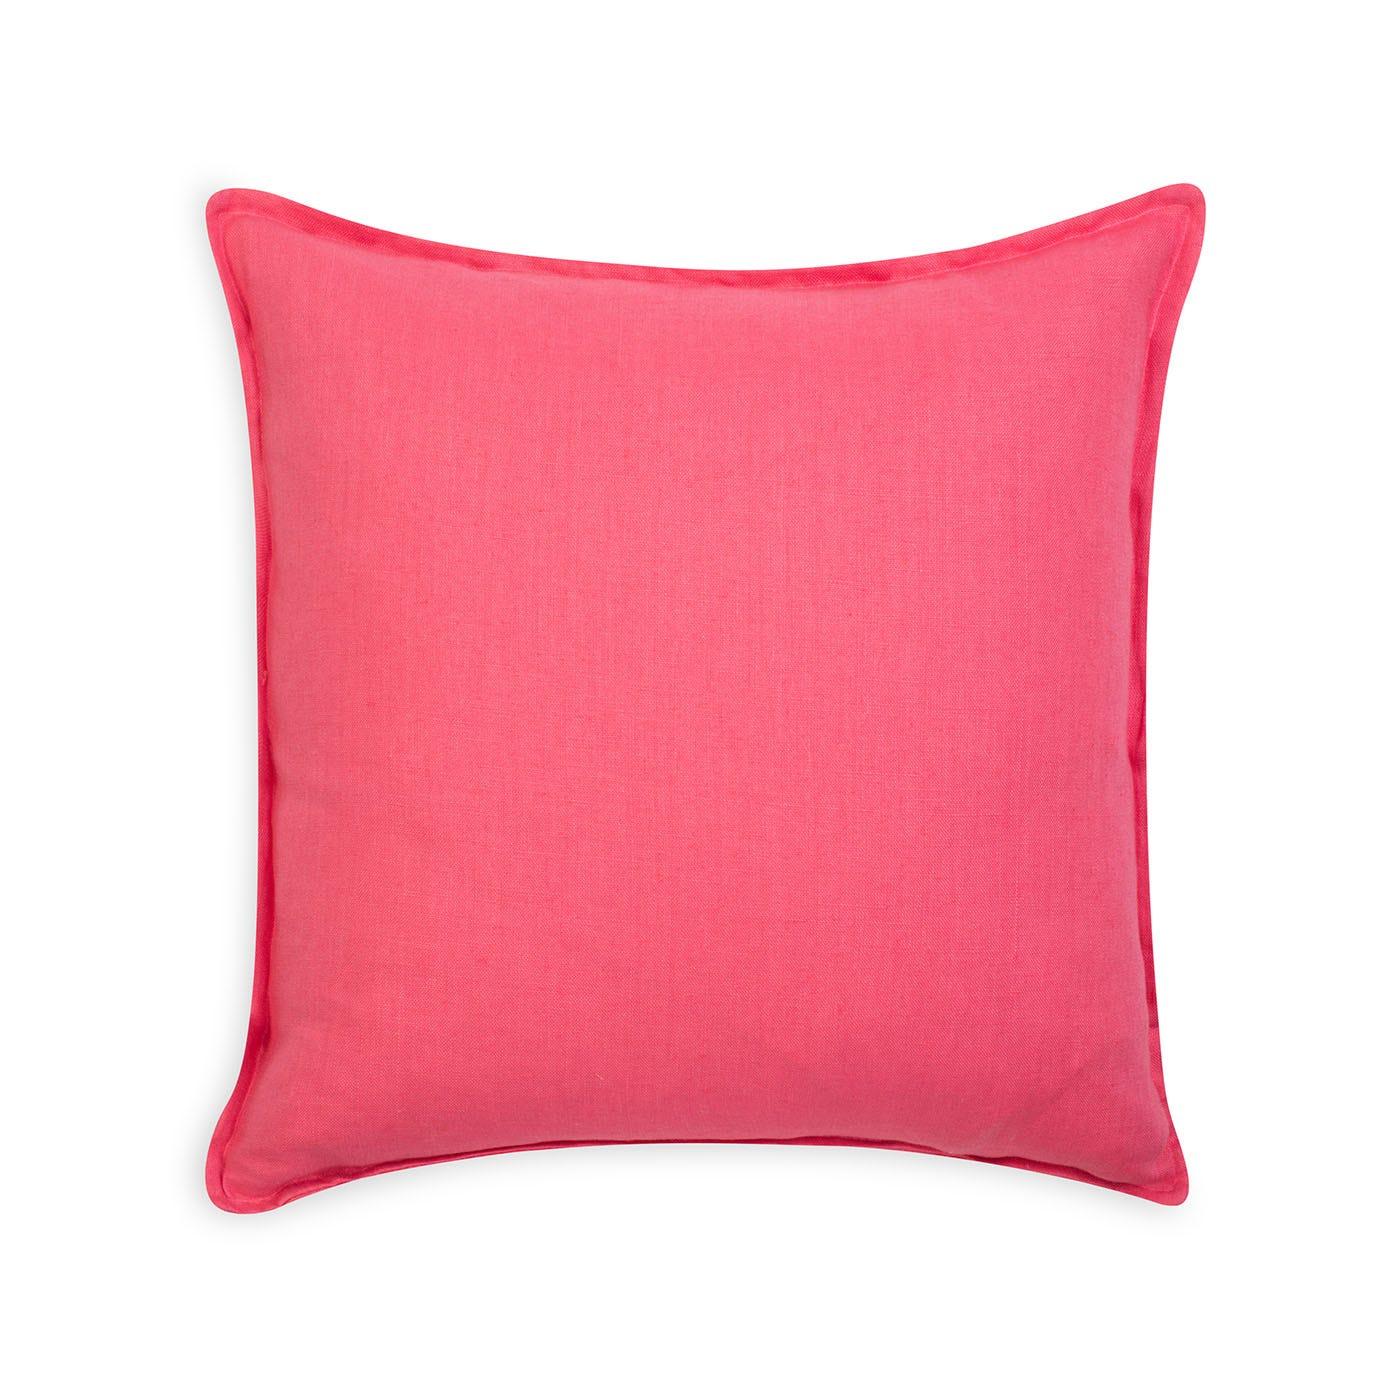 Heal's Linen Cushion